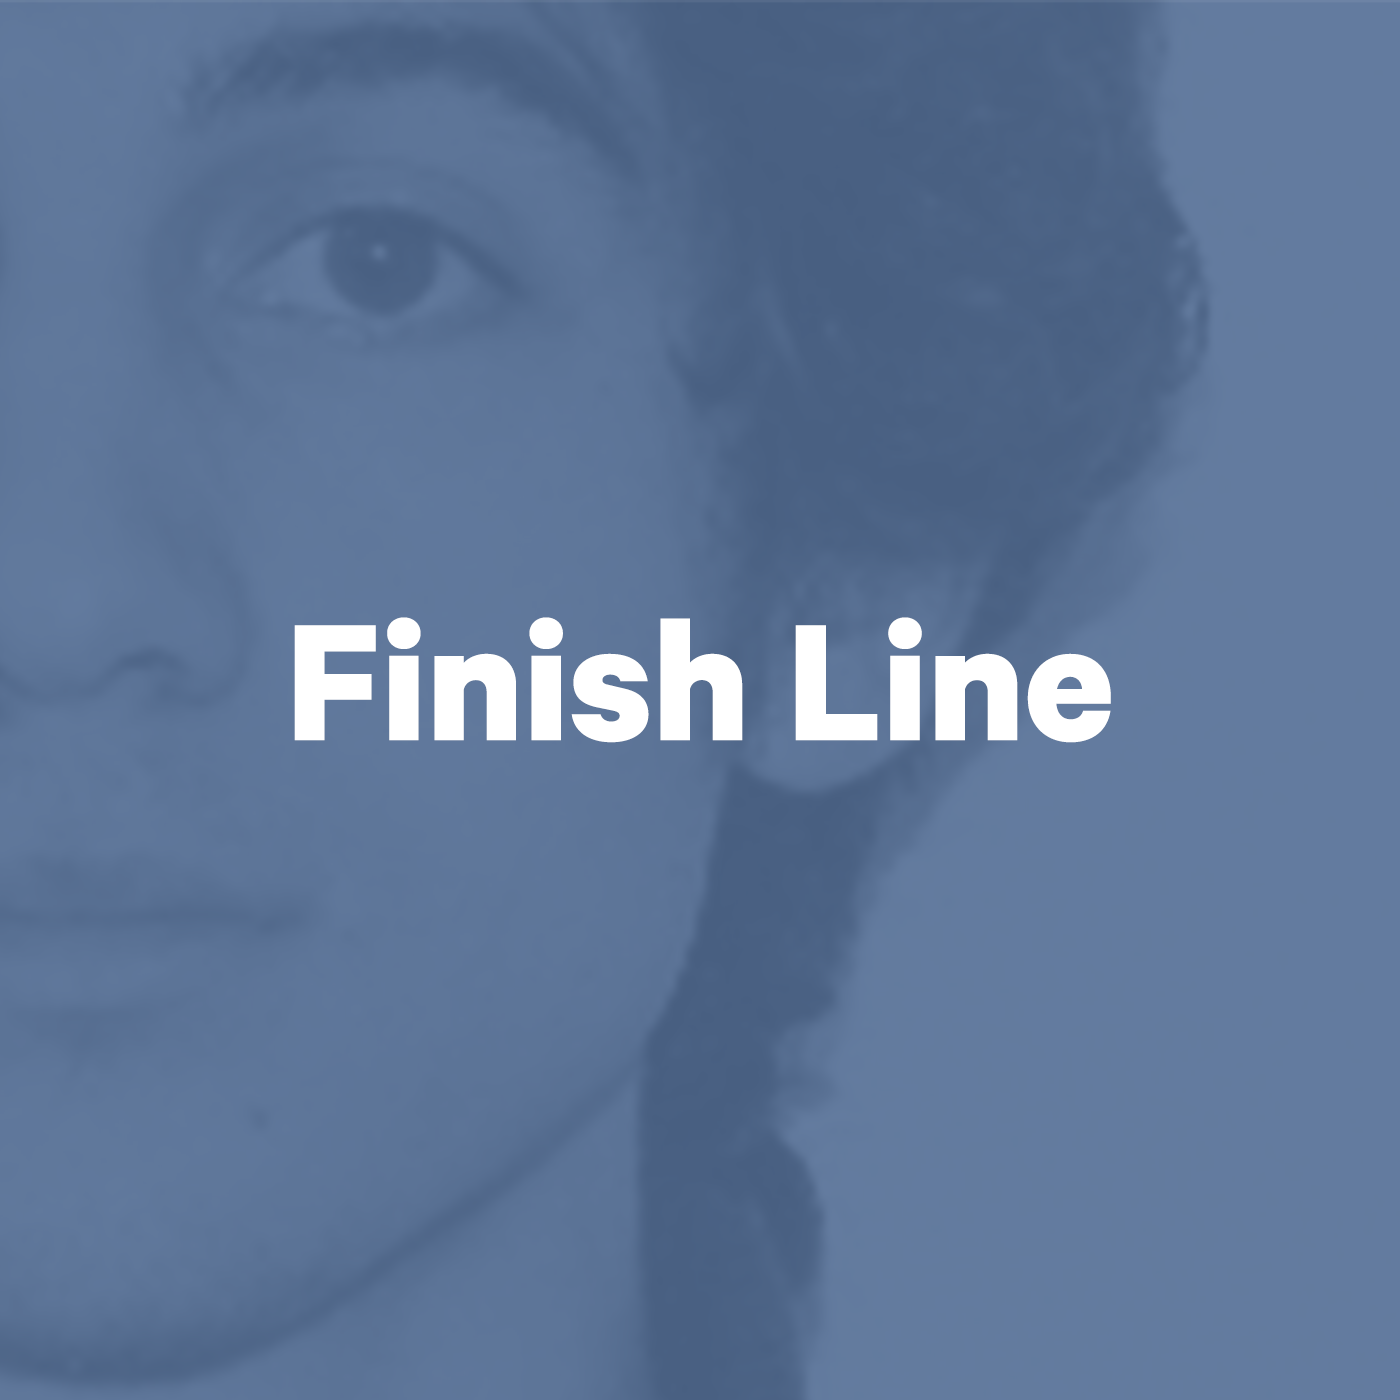 <![CDATA[Finish Line]]>